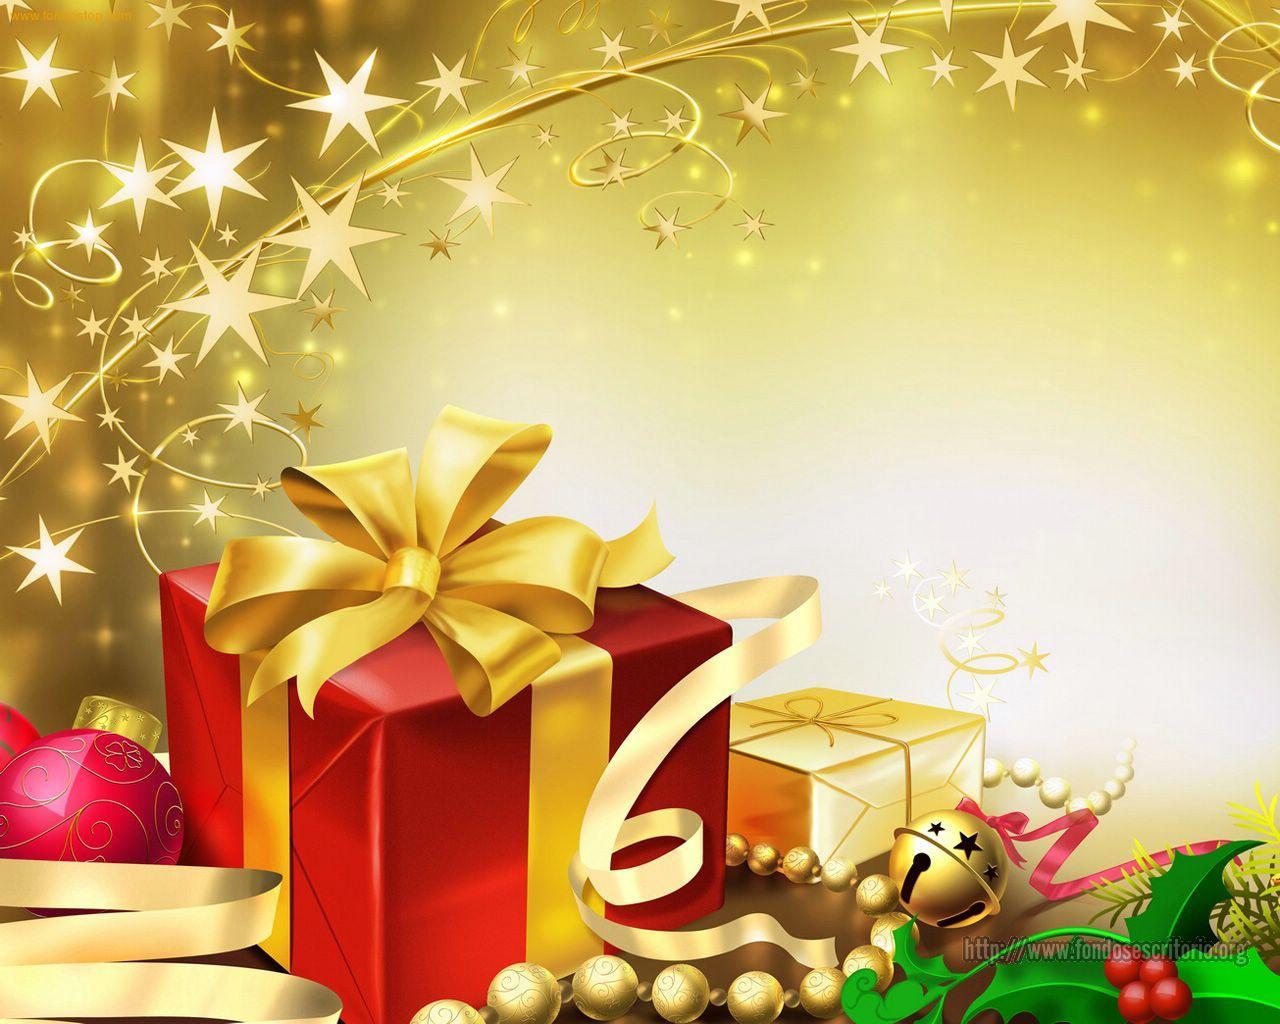 navidadporsiempre